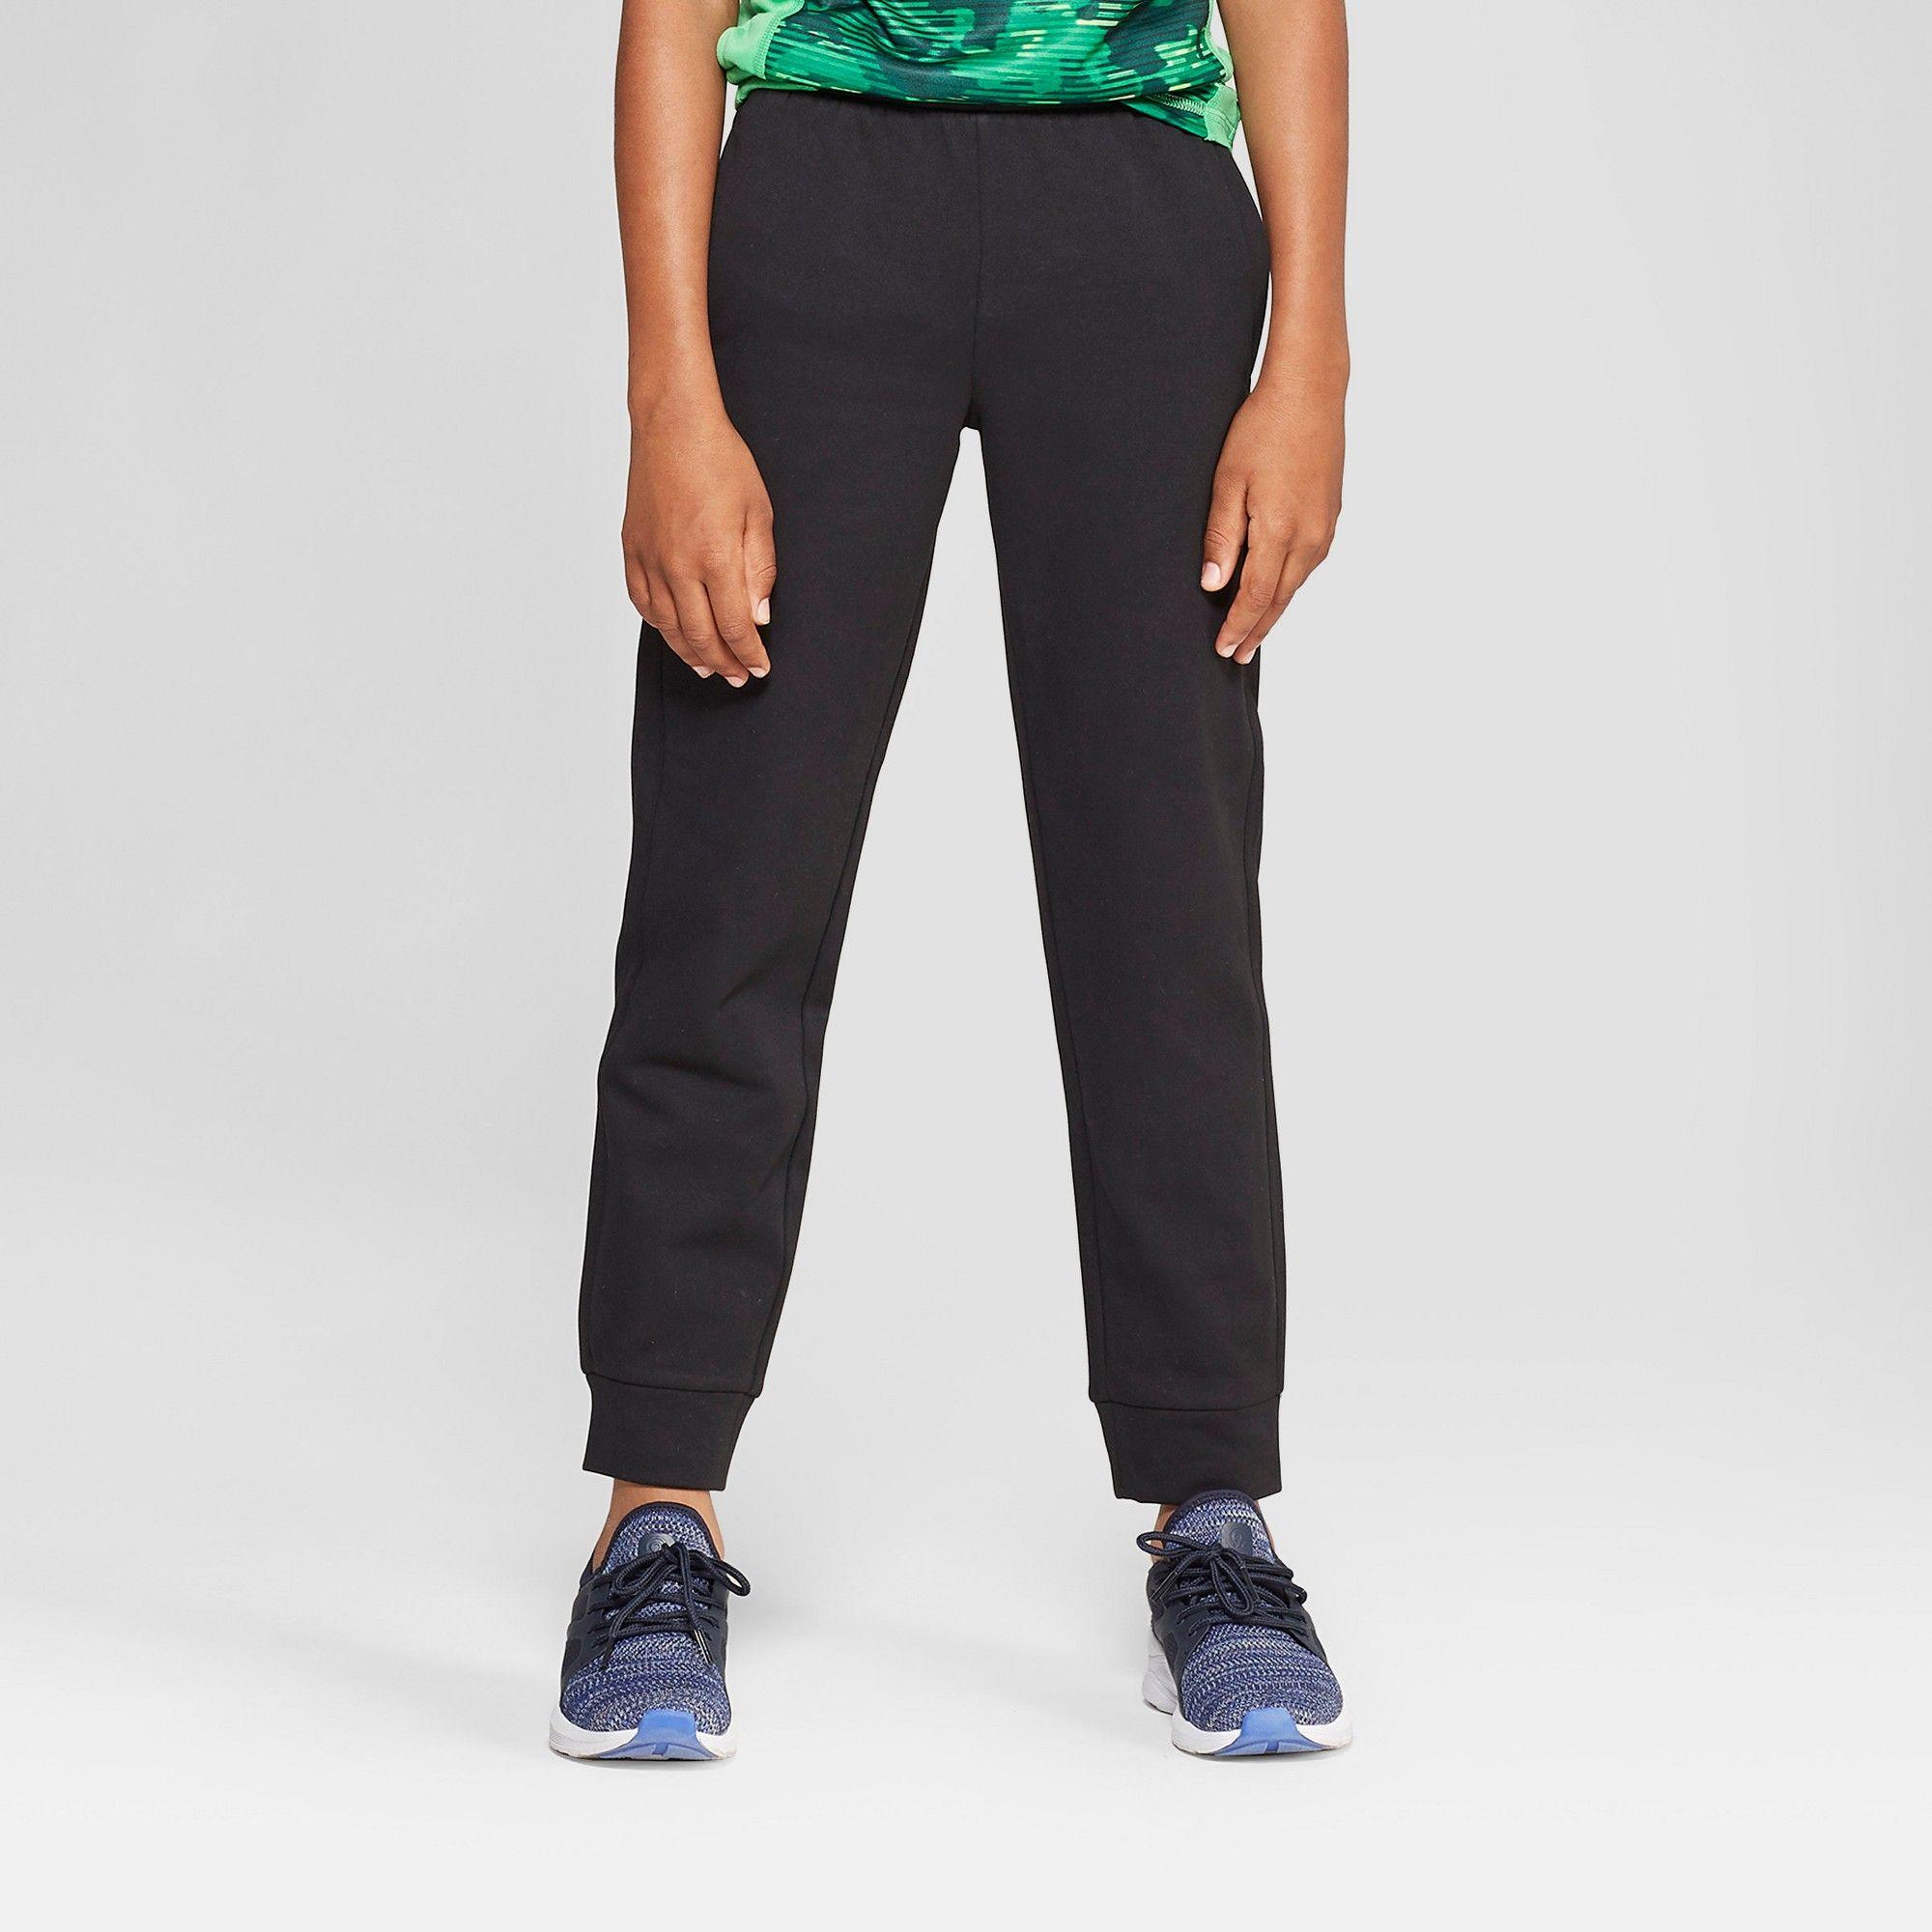 1a8cd1a6 Boys' Tech Fleece Jogger Pants - C9 Champion Black XS | Products